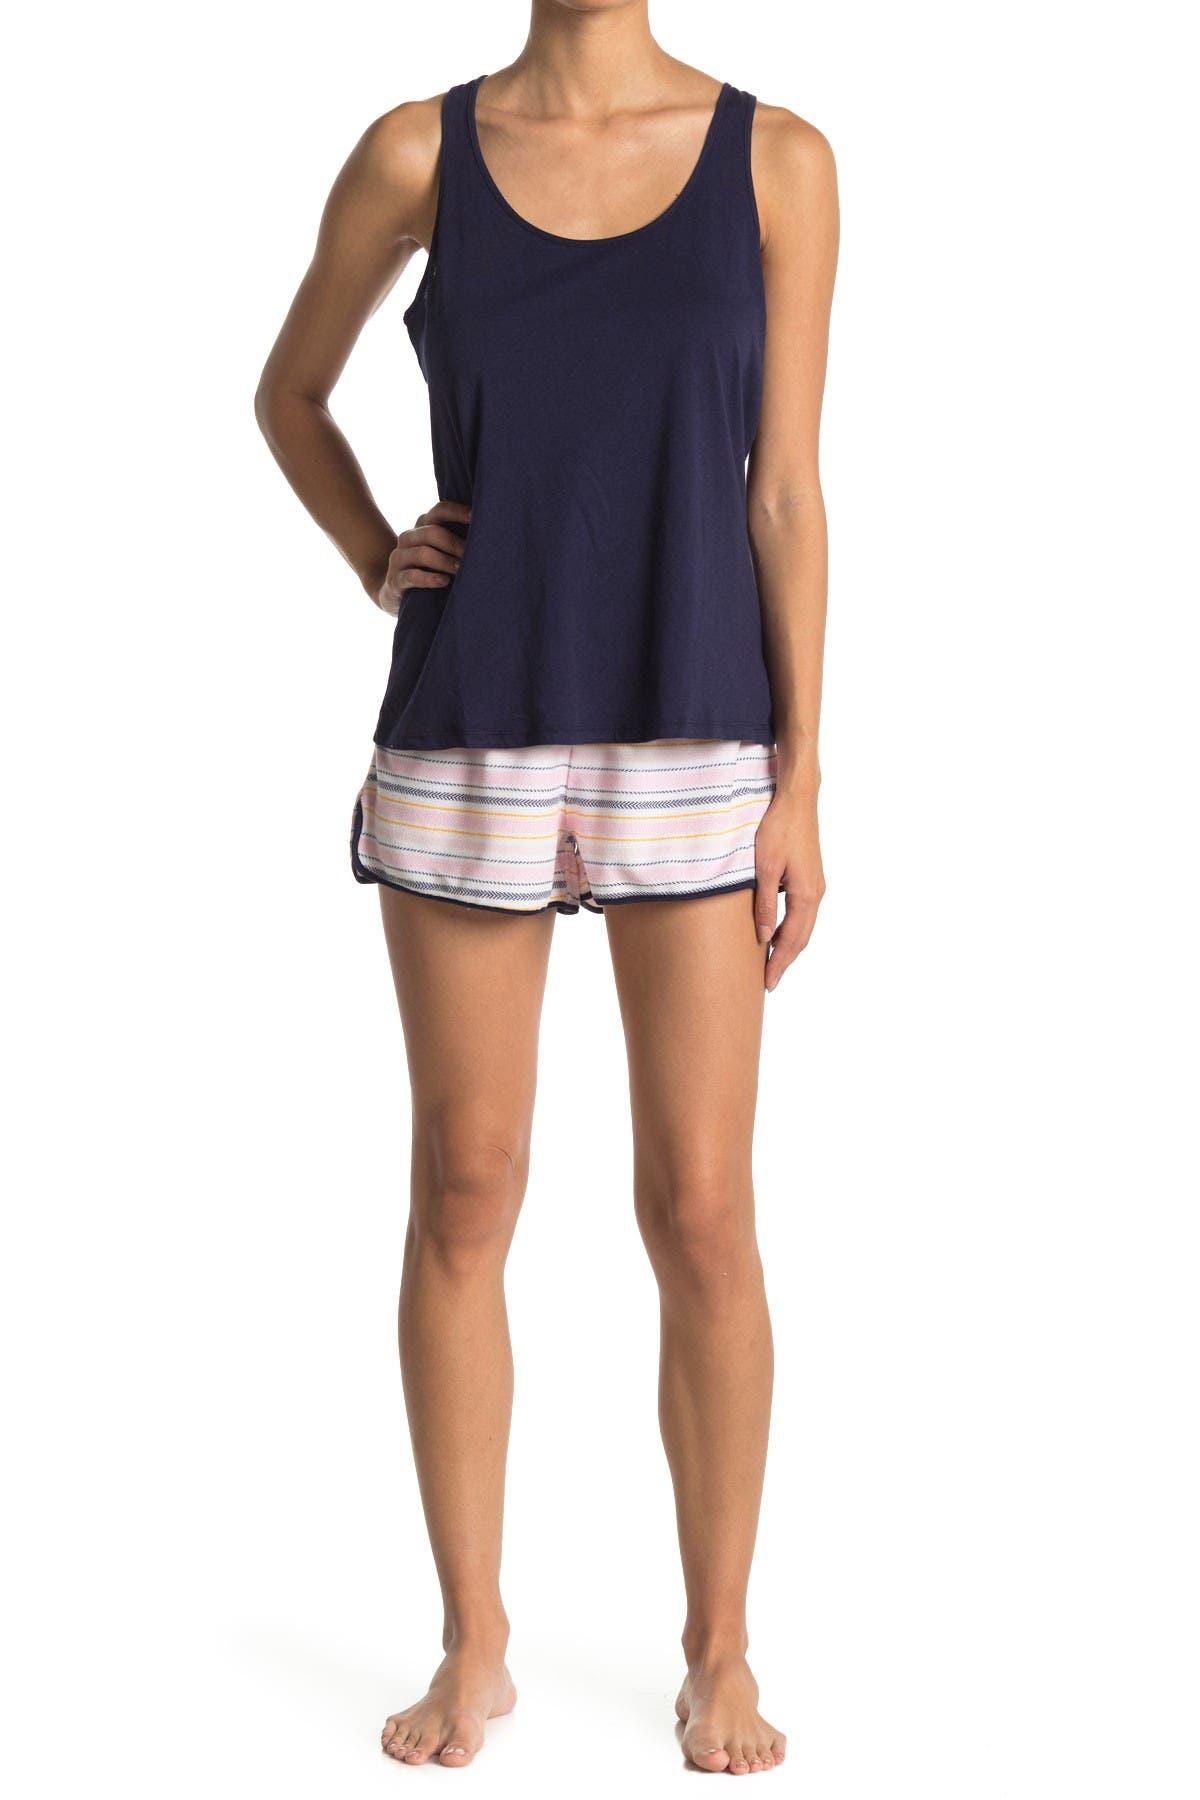 Image of Jane & Bleecker New York Top & Shorts 2-Piece Pajama Set